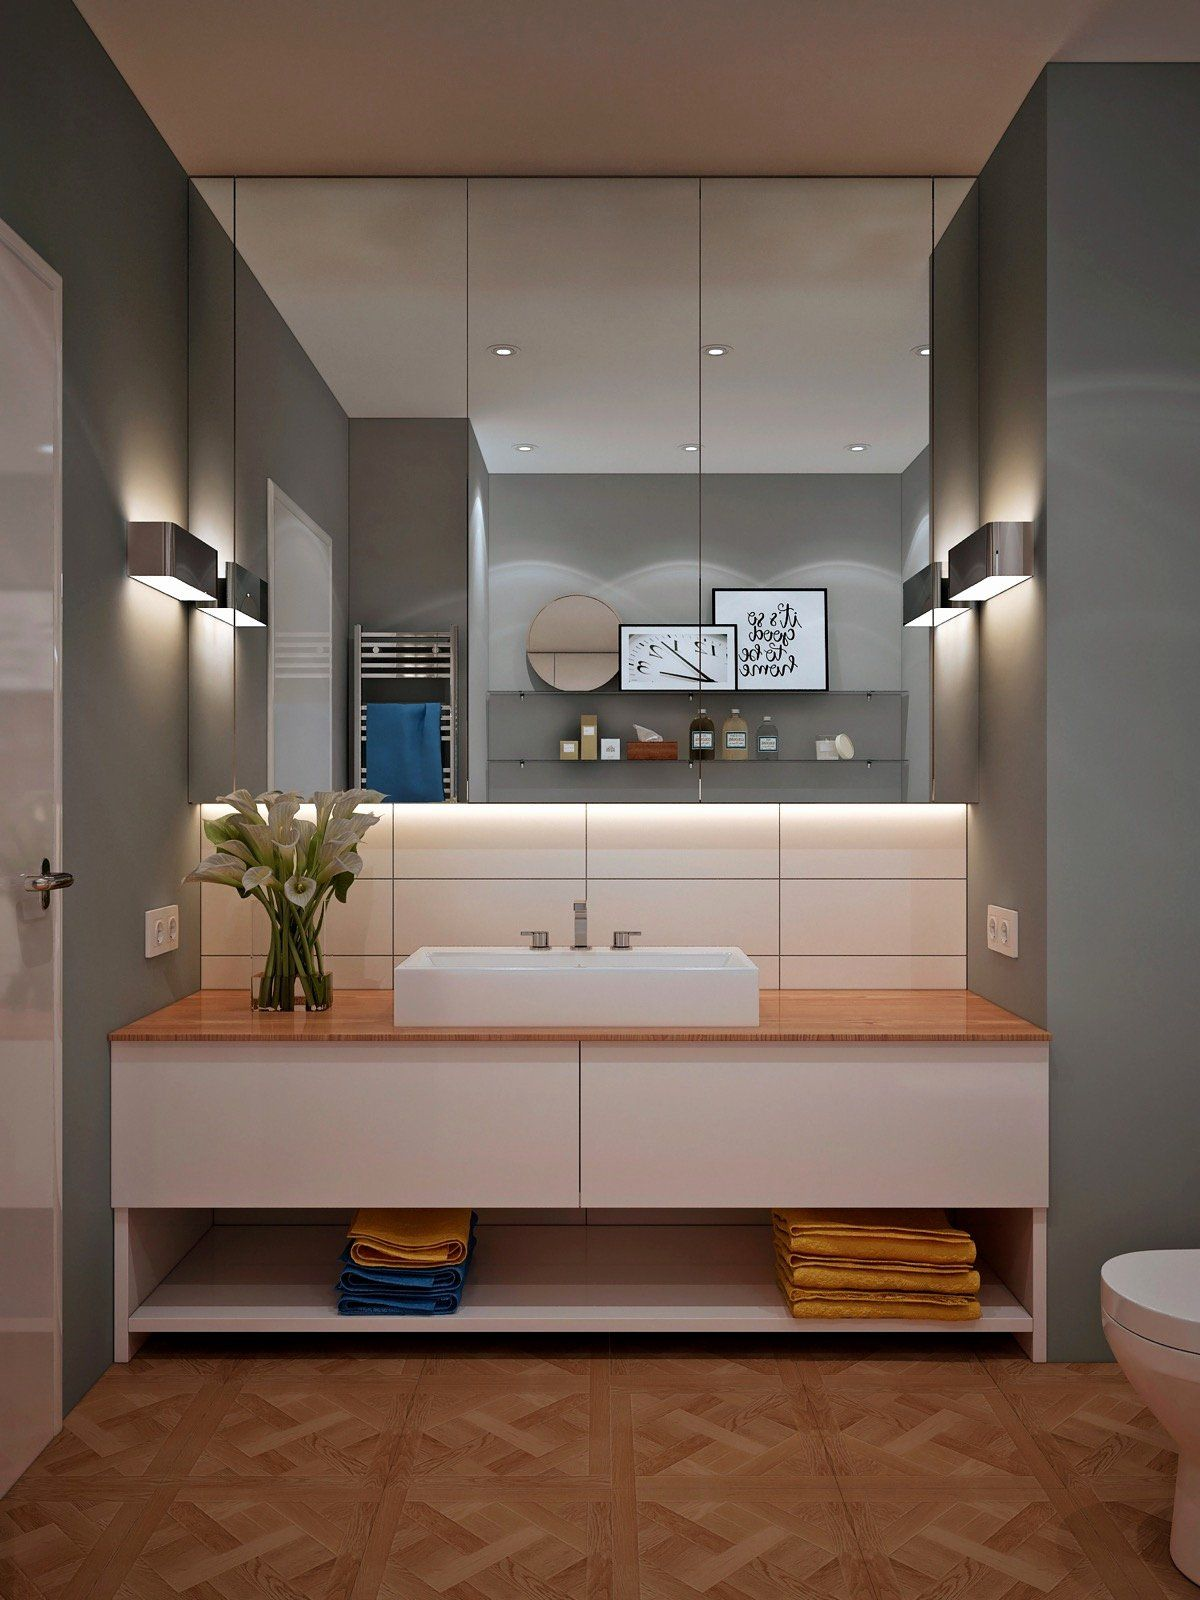 Design House Bathroom Vanities Lovely 40 Modern Bathroom Vanities That Overflow With Style